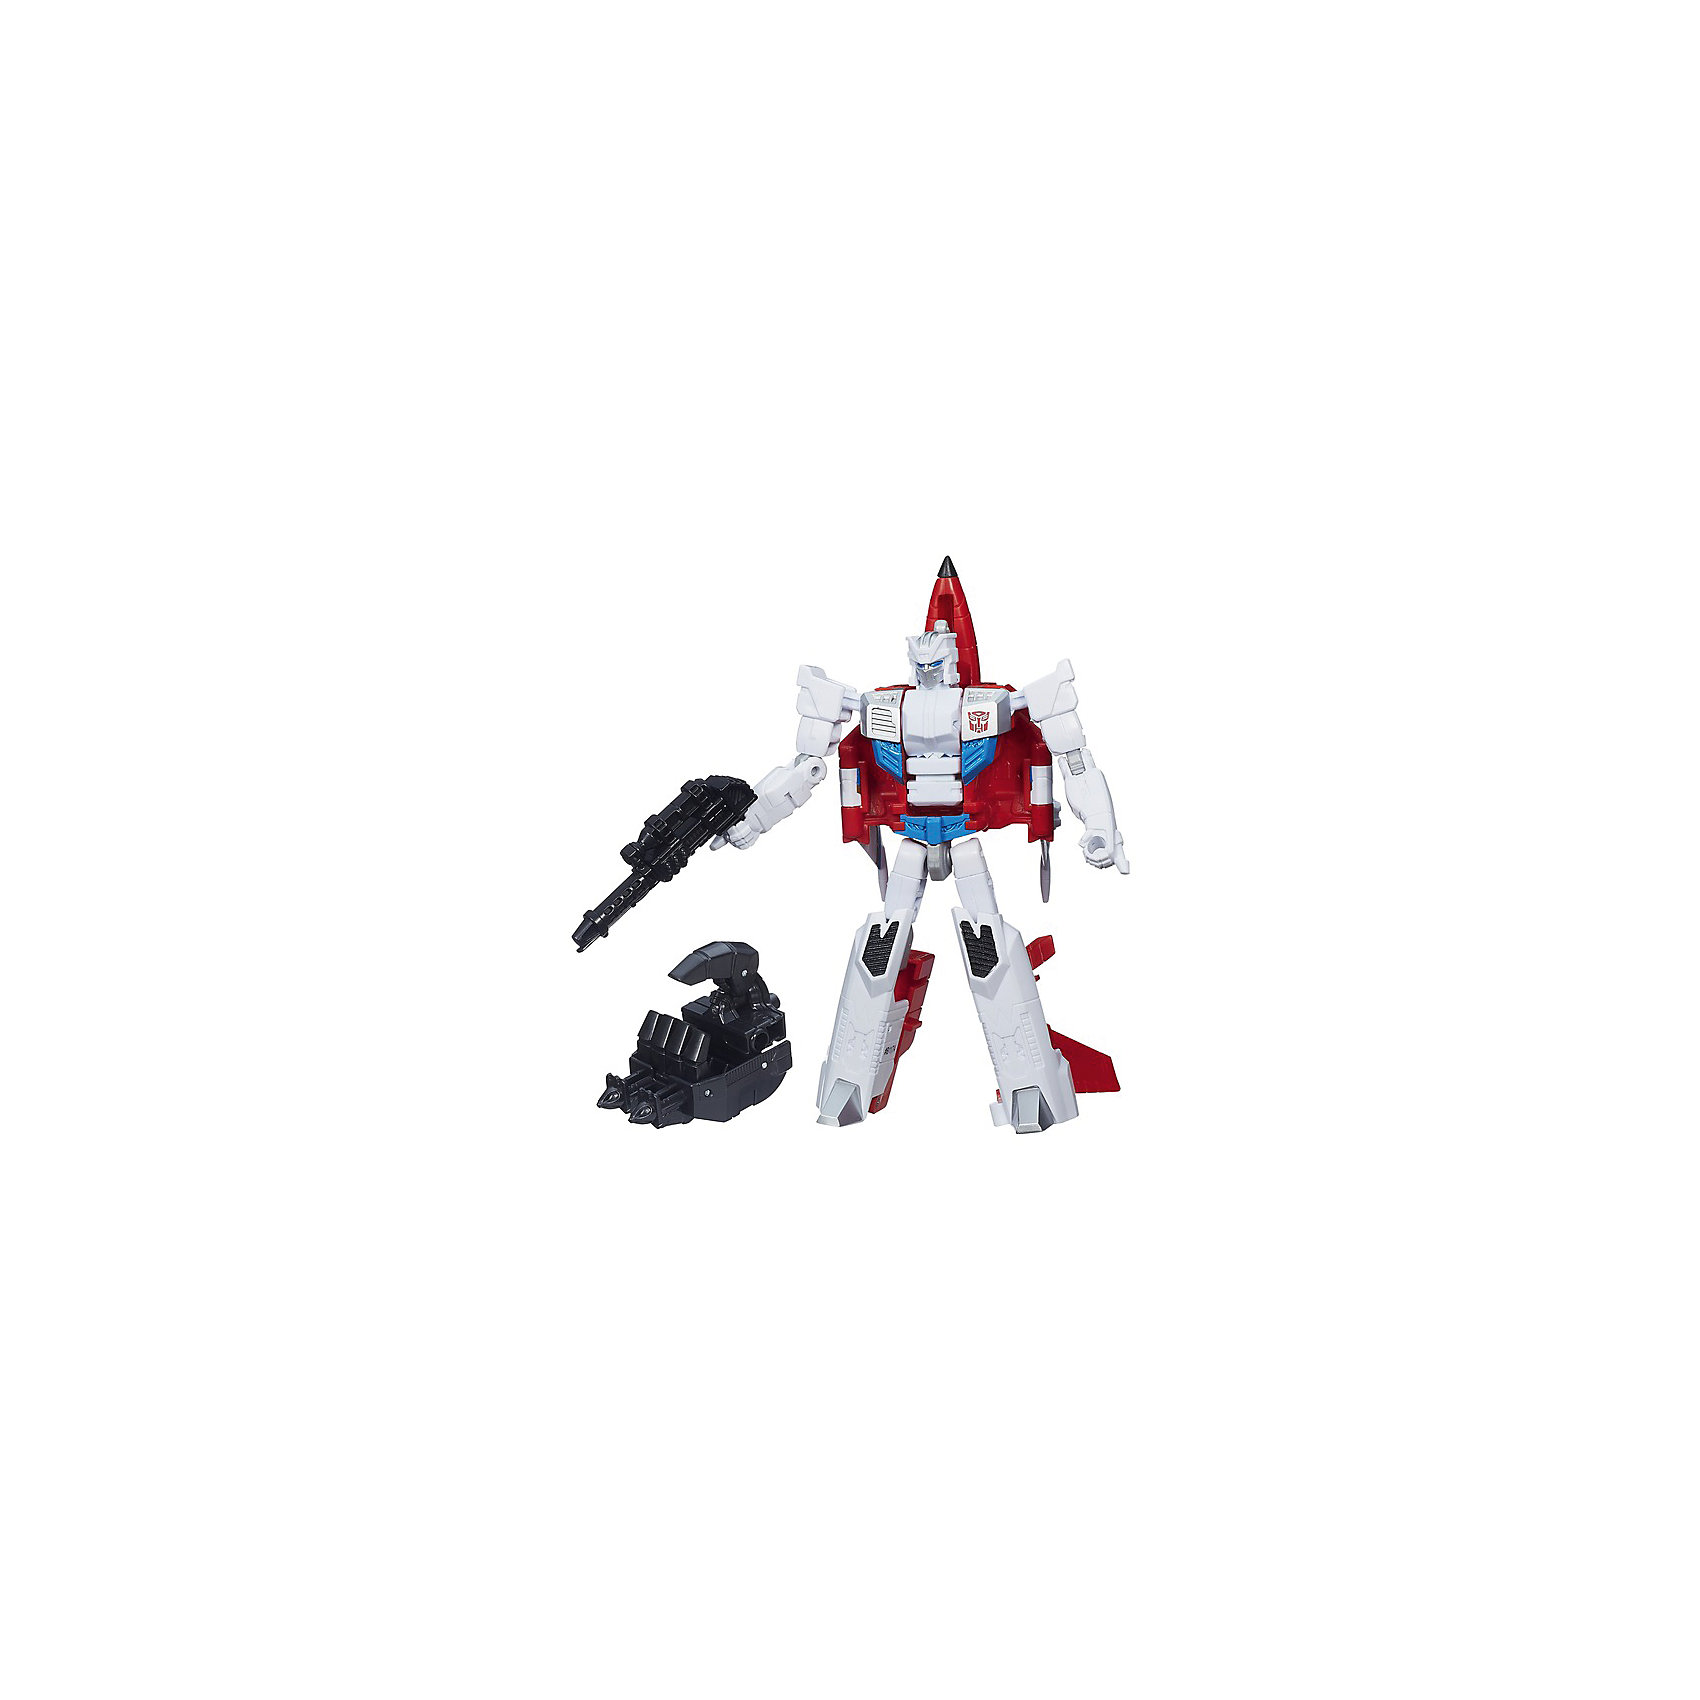 Hasbro Дженерэйшнс Делюкс, Трансформеры, B0974/B5606 transformers b0974 делюкс свиндл